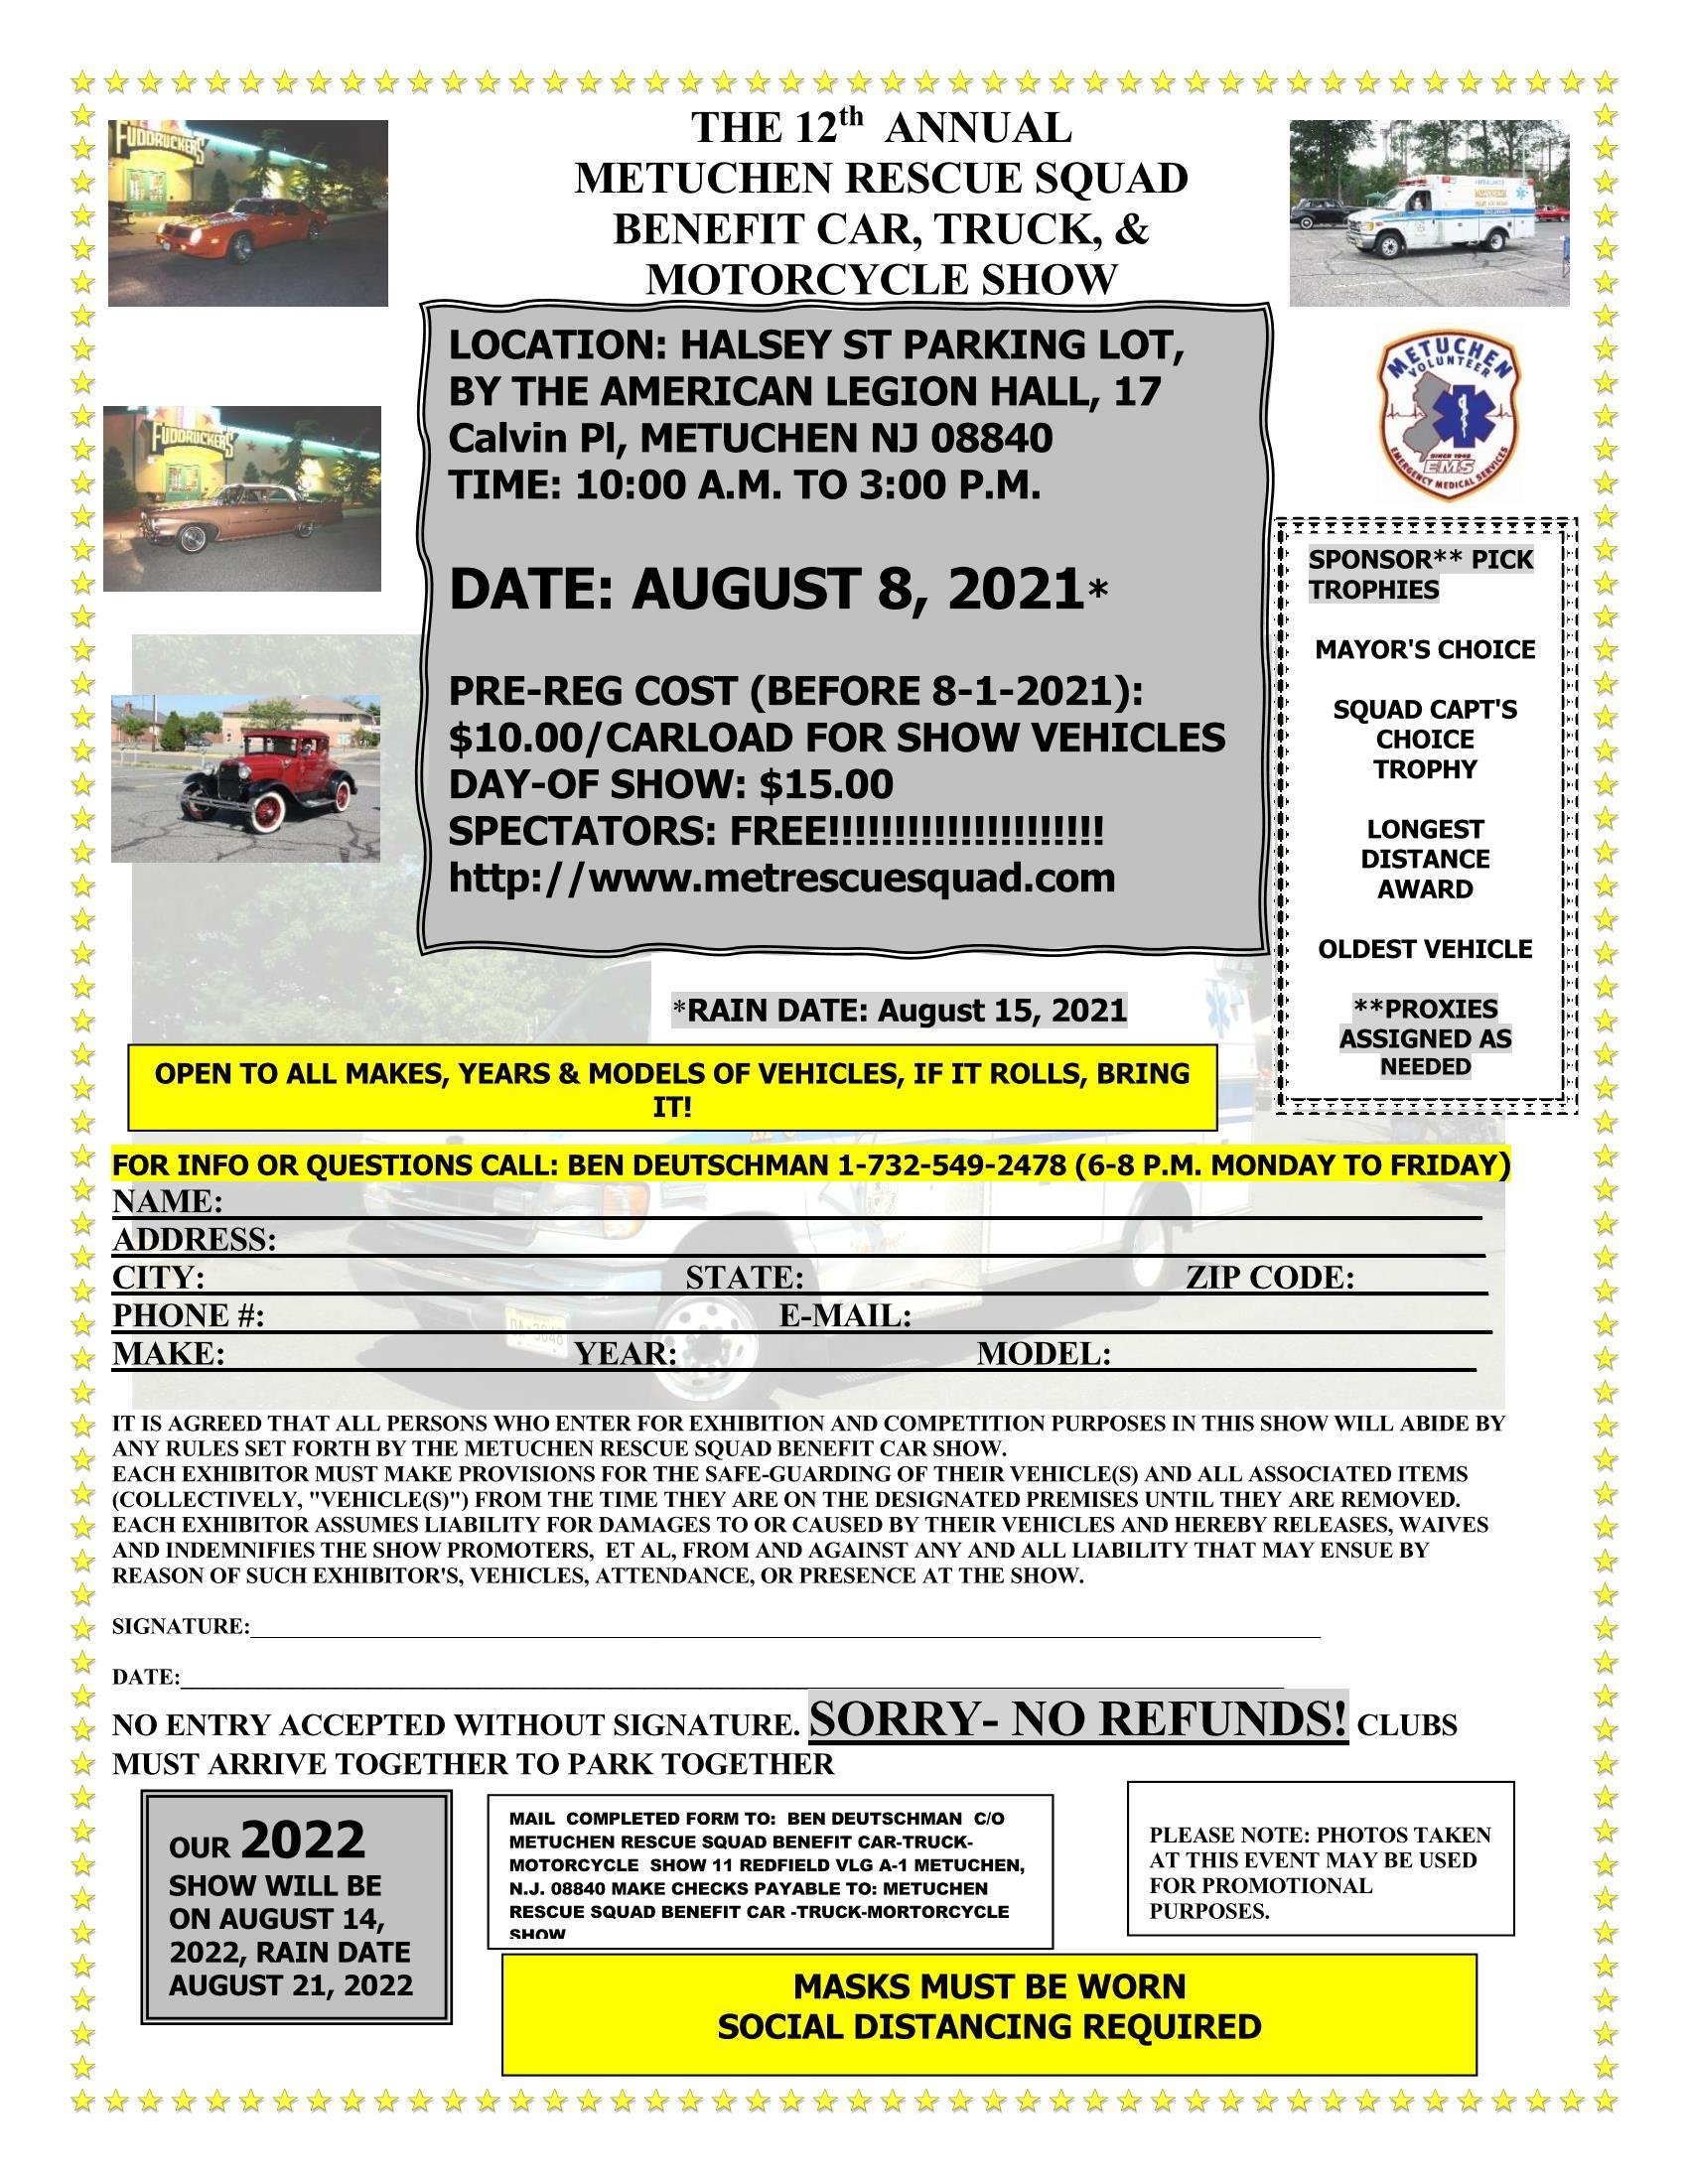 2021SHOWFlyer 2WithEMSLogo HalseyStreetParkingLot Mask SocialDistancingAdded 1 - Metuchen Rescue Squad Benefit Car-Truck-Motorcycle Show